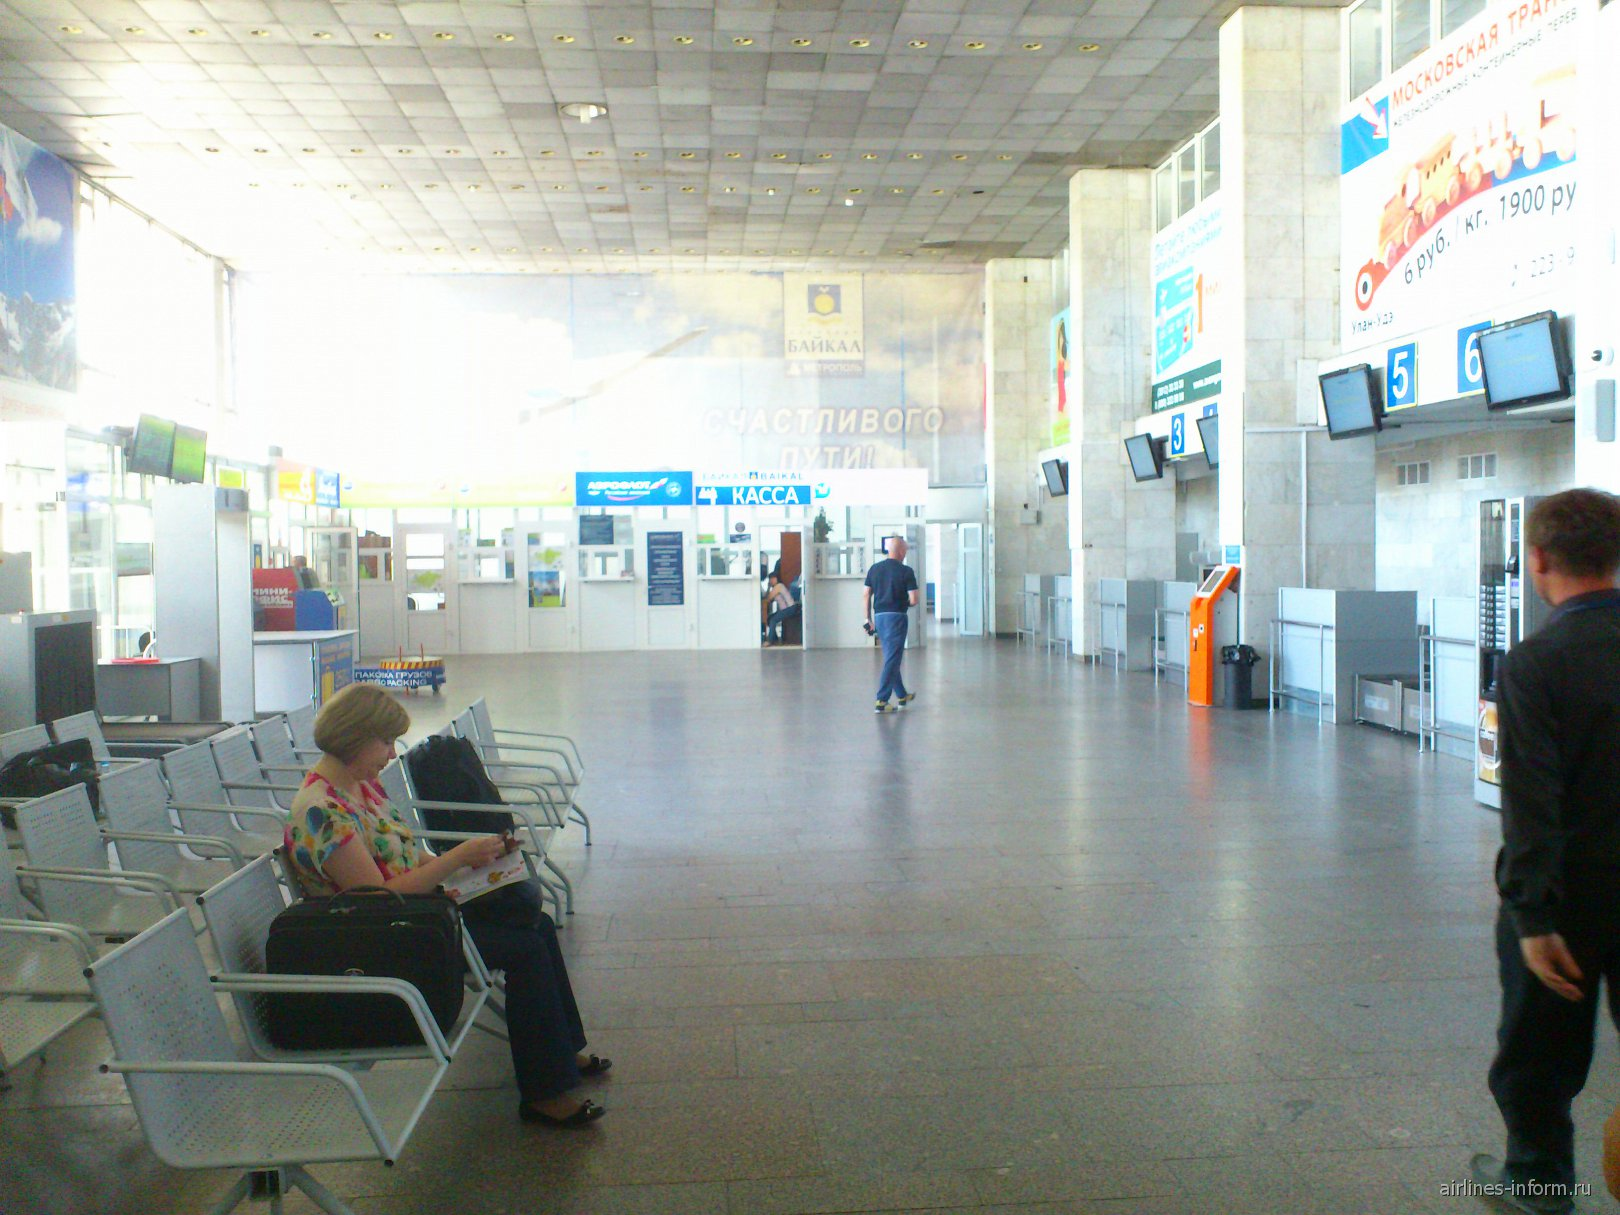 Зал вылета в аэропорту Улан-Удэ